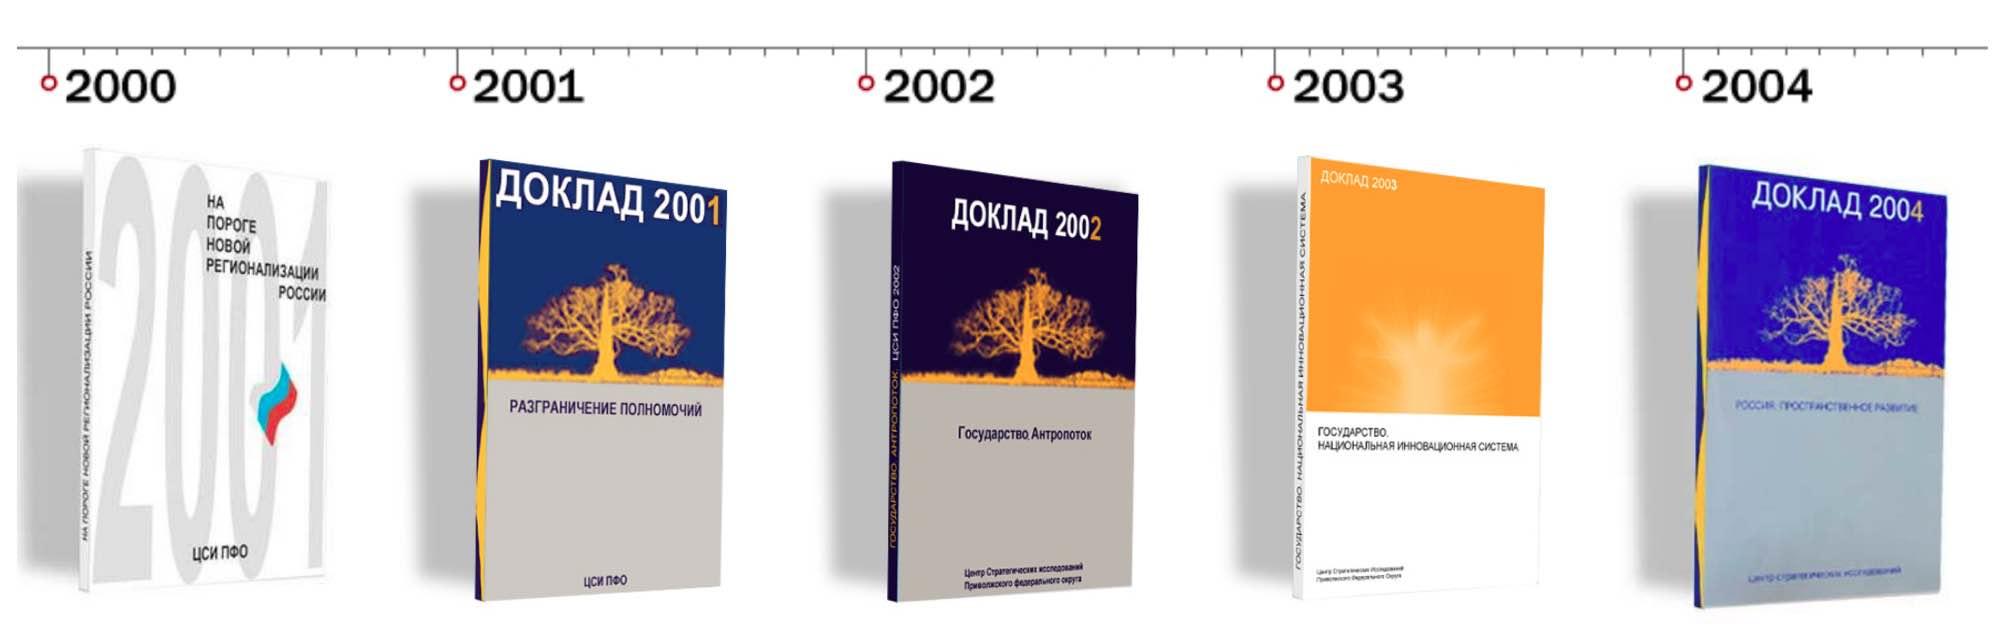 хронология докладов ЦСИ ПФО 2000-2004 гг